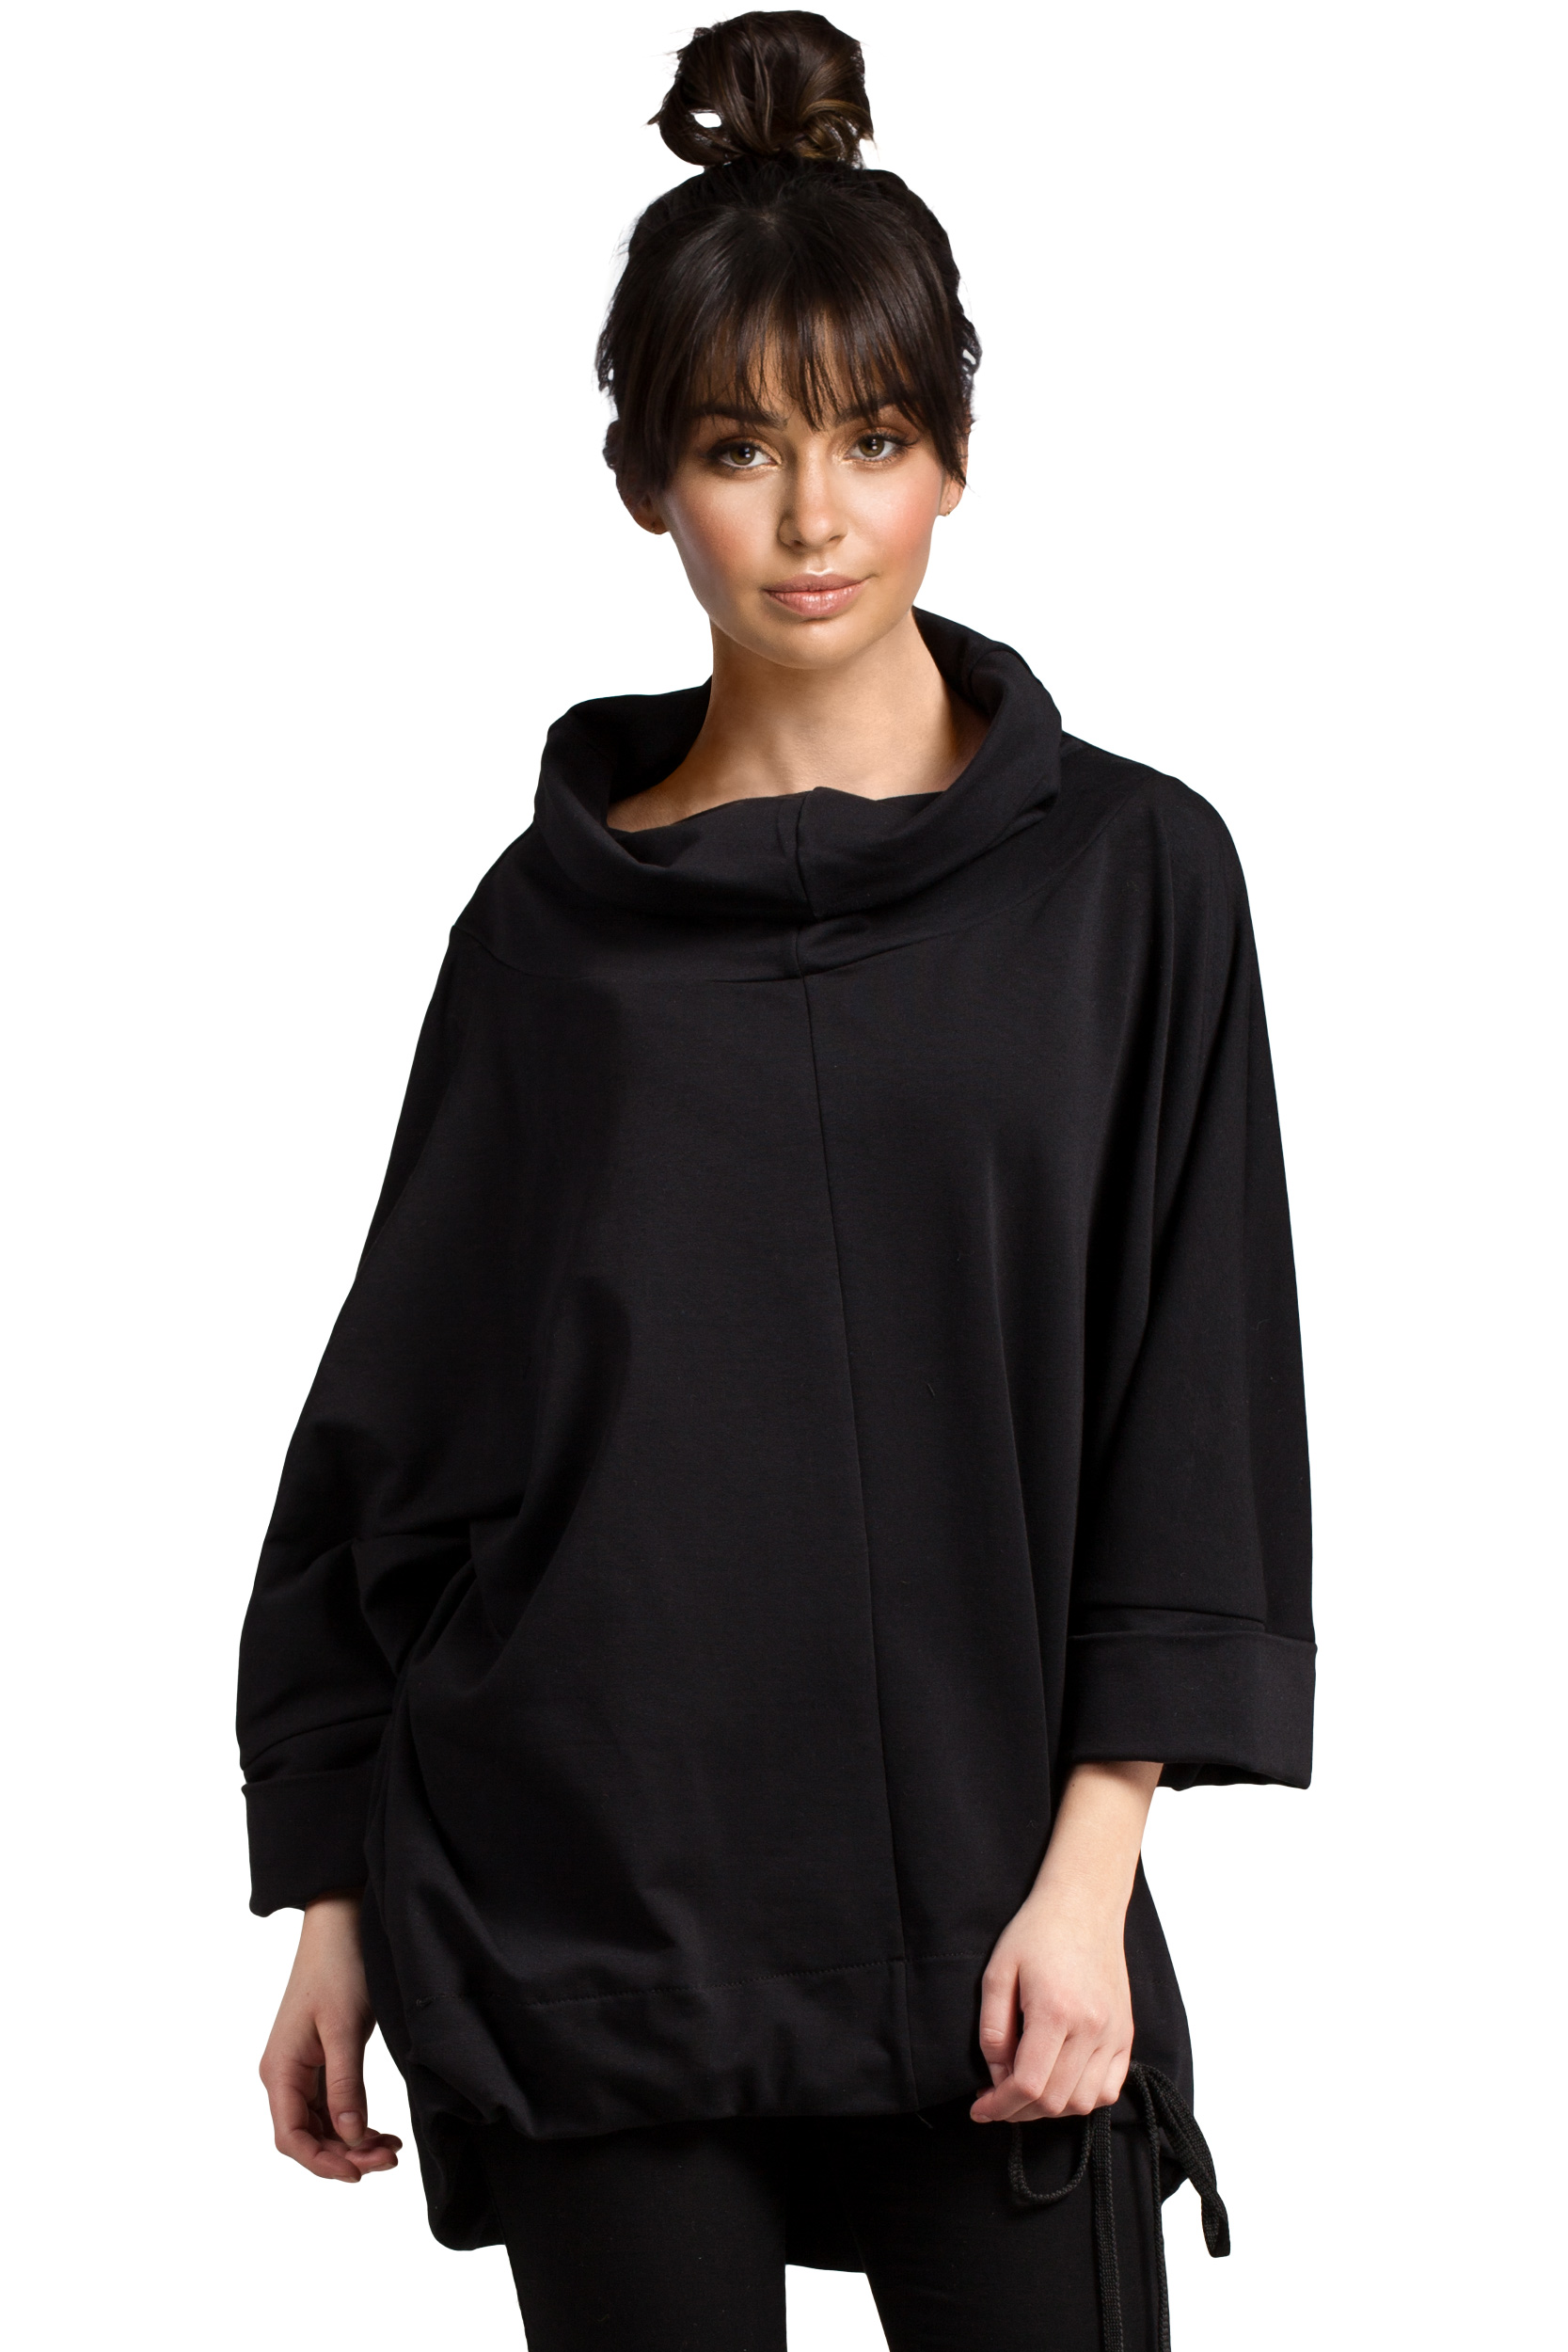 5b617bad Damska bawełniana bluza oversize z kominem czarna B027